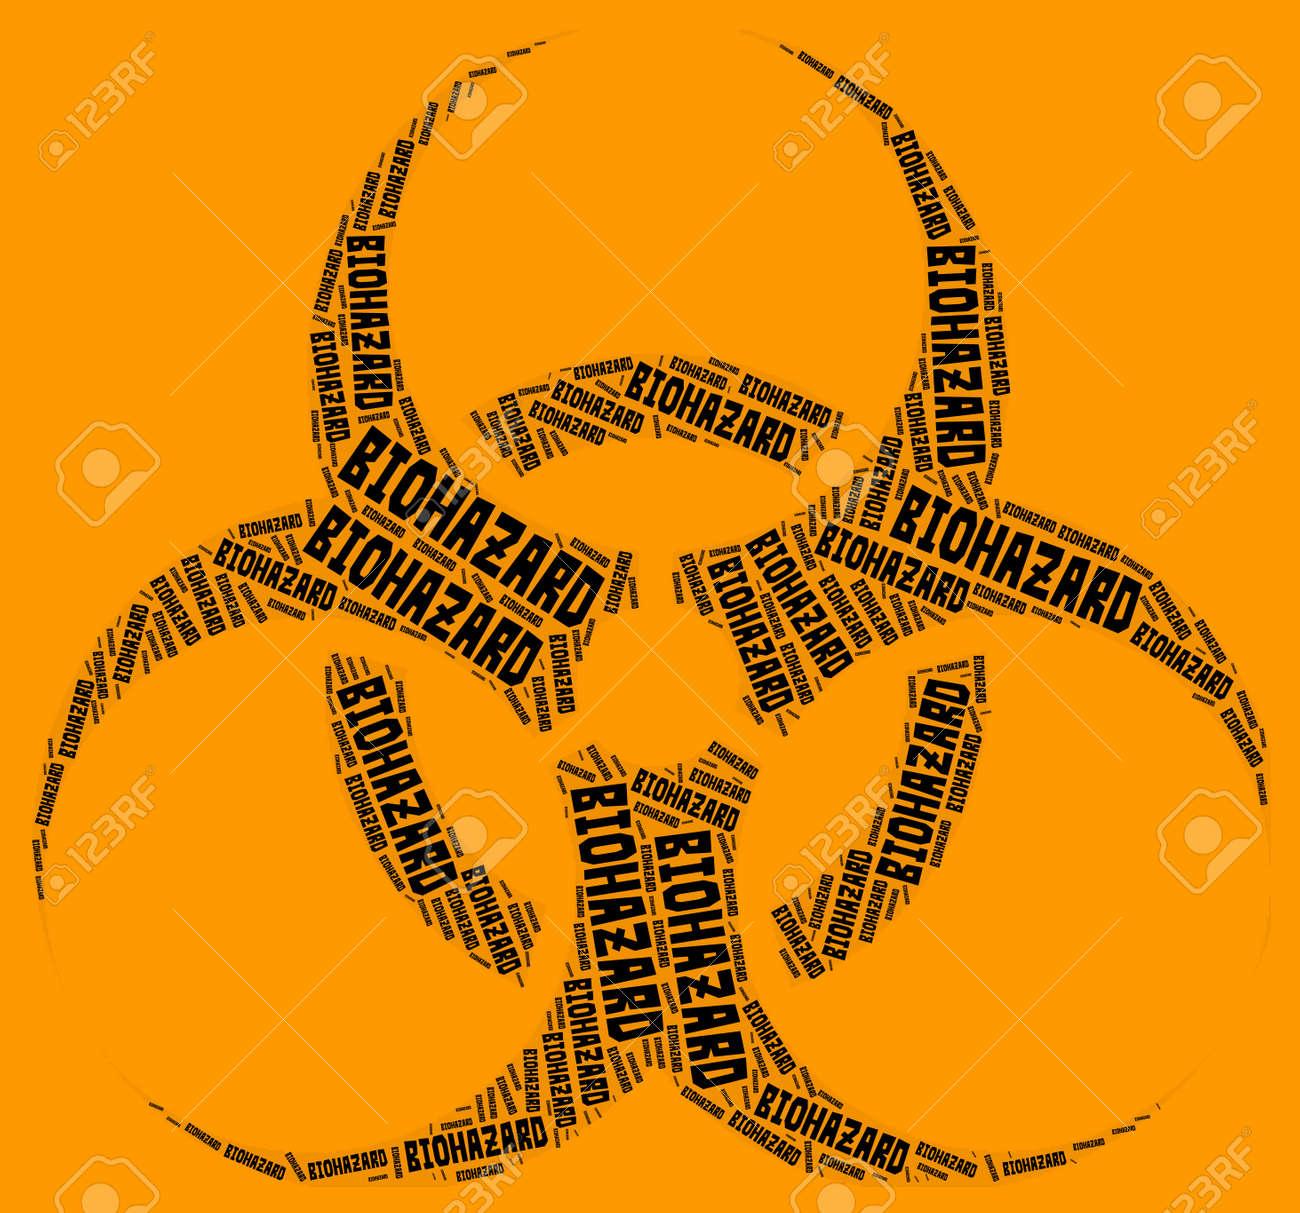 Biohazard Symbol Word Cloud Black Word Cloud Over Orange Background